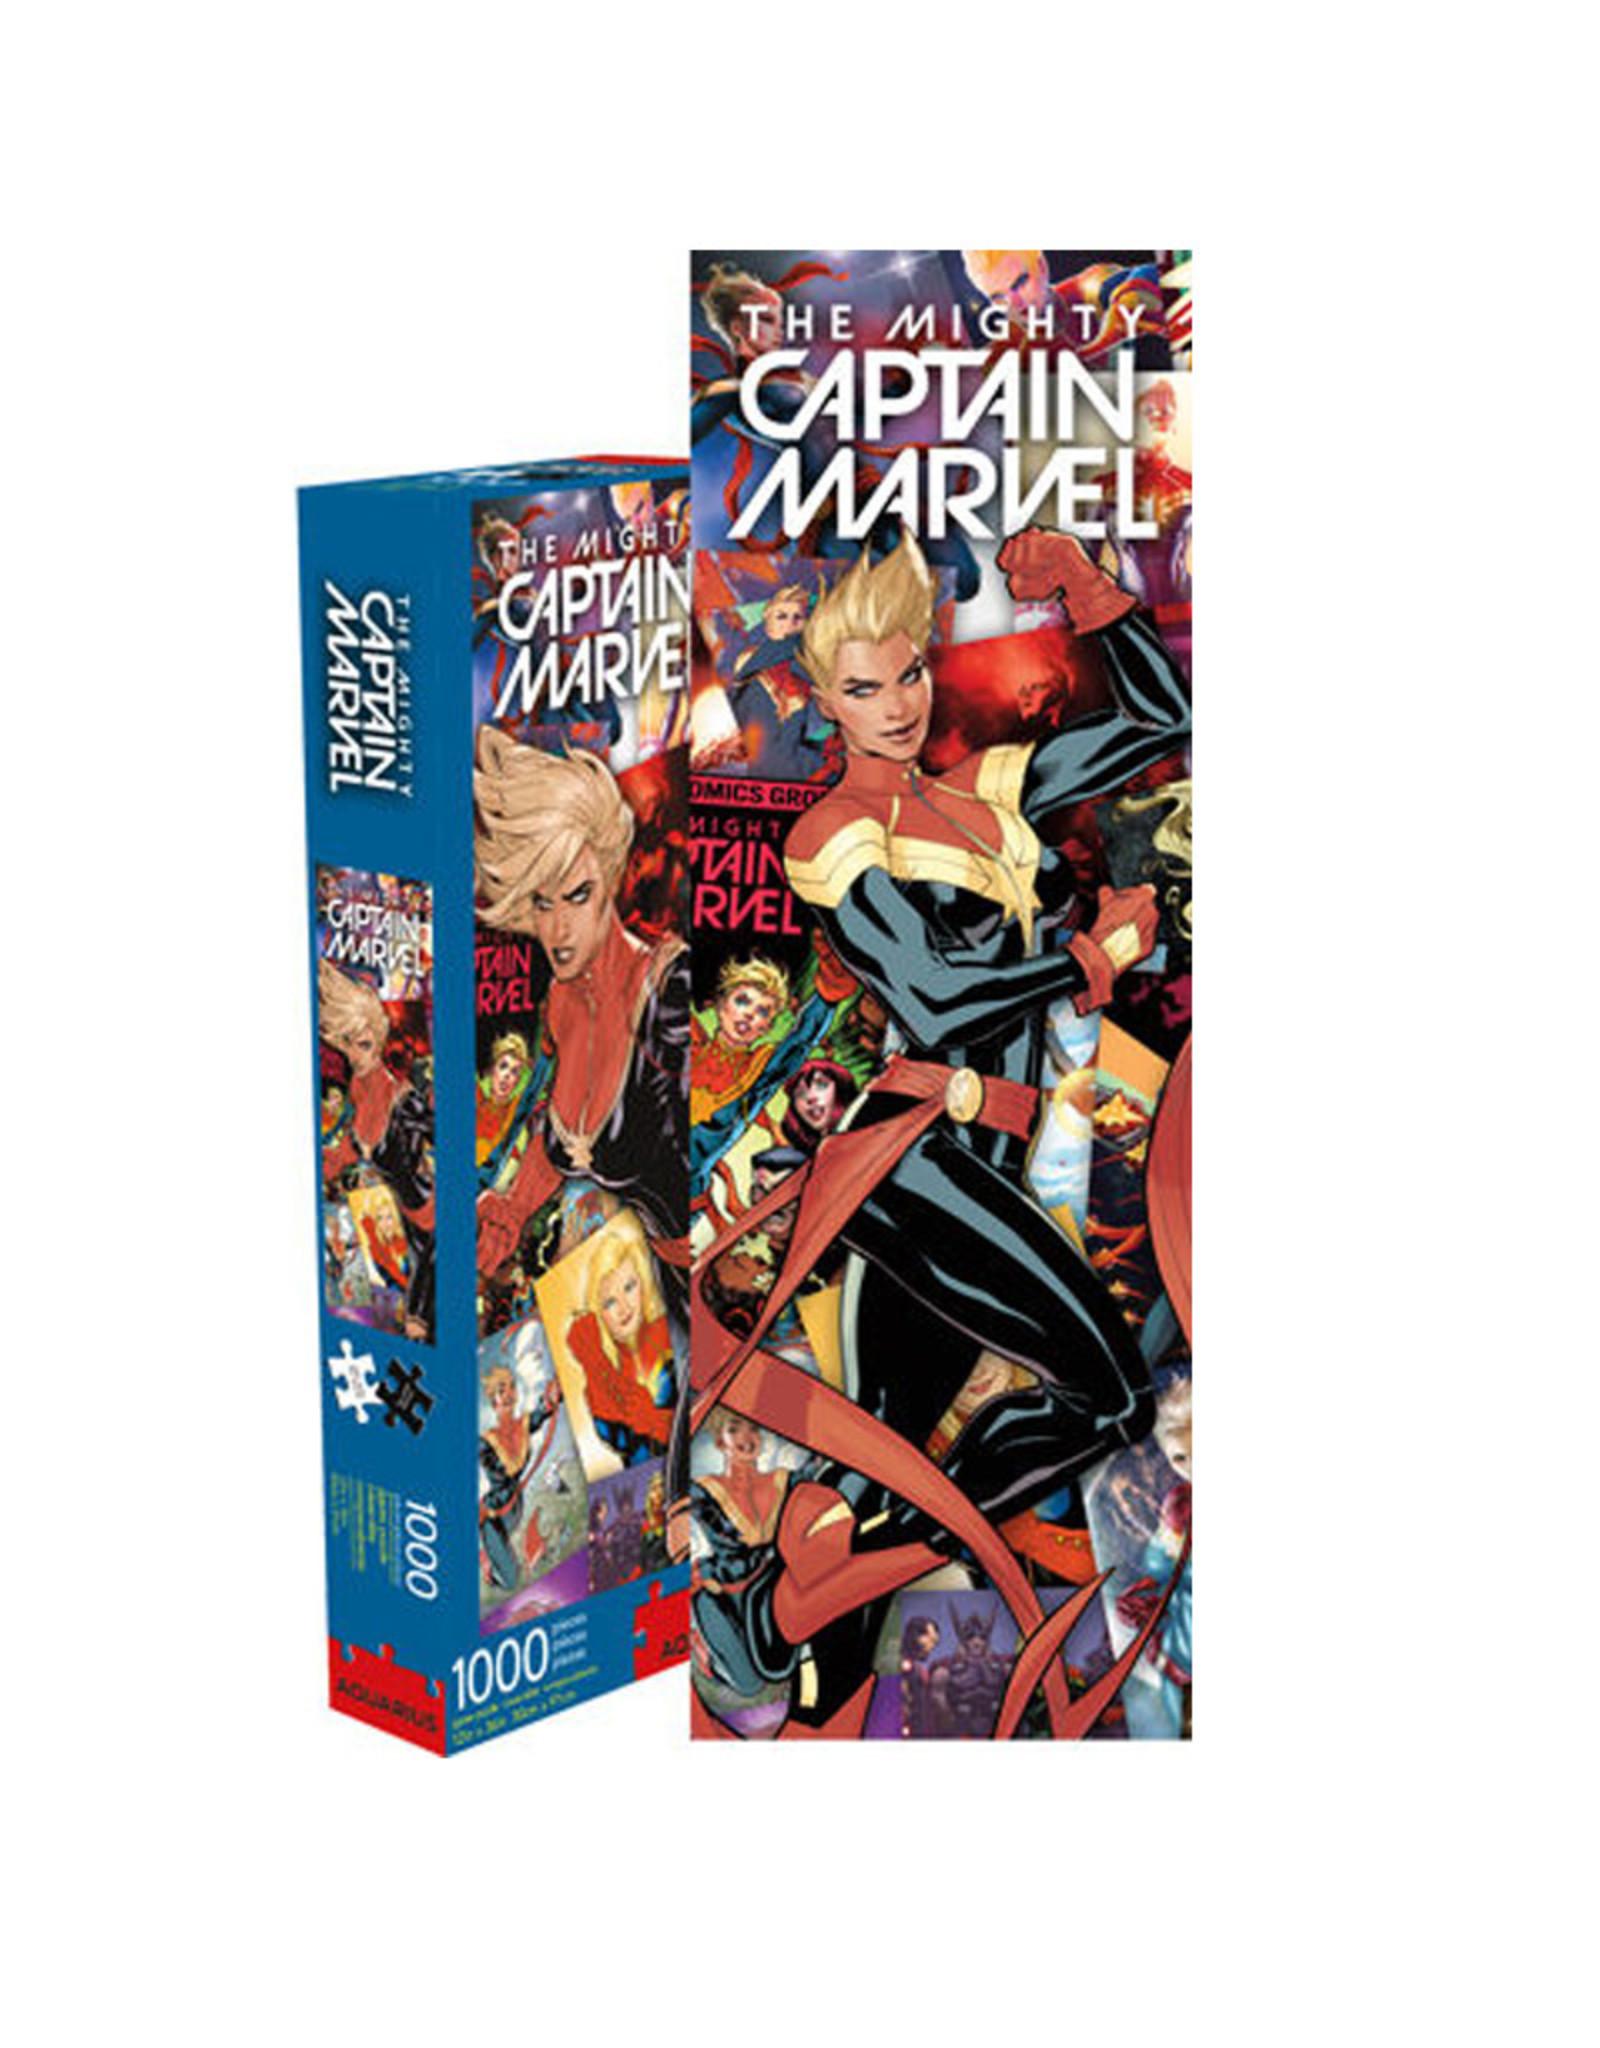 Marvel ( Puzzle 1000 pcs ) The mighty Captain Marvel